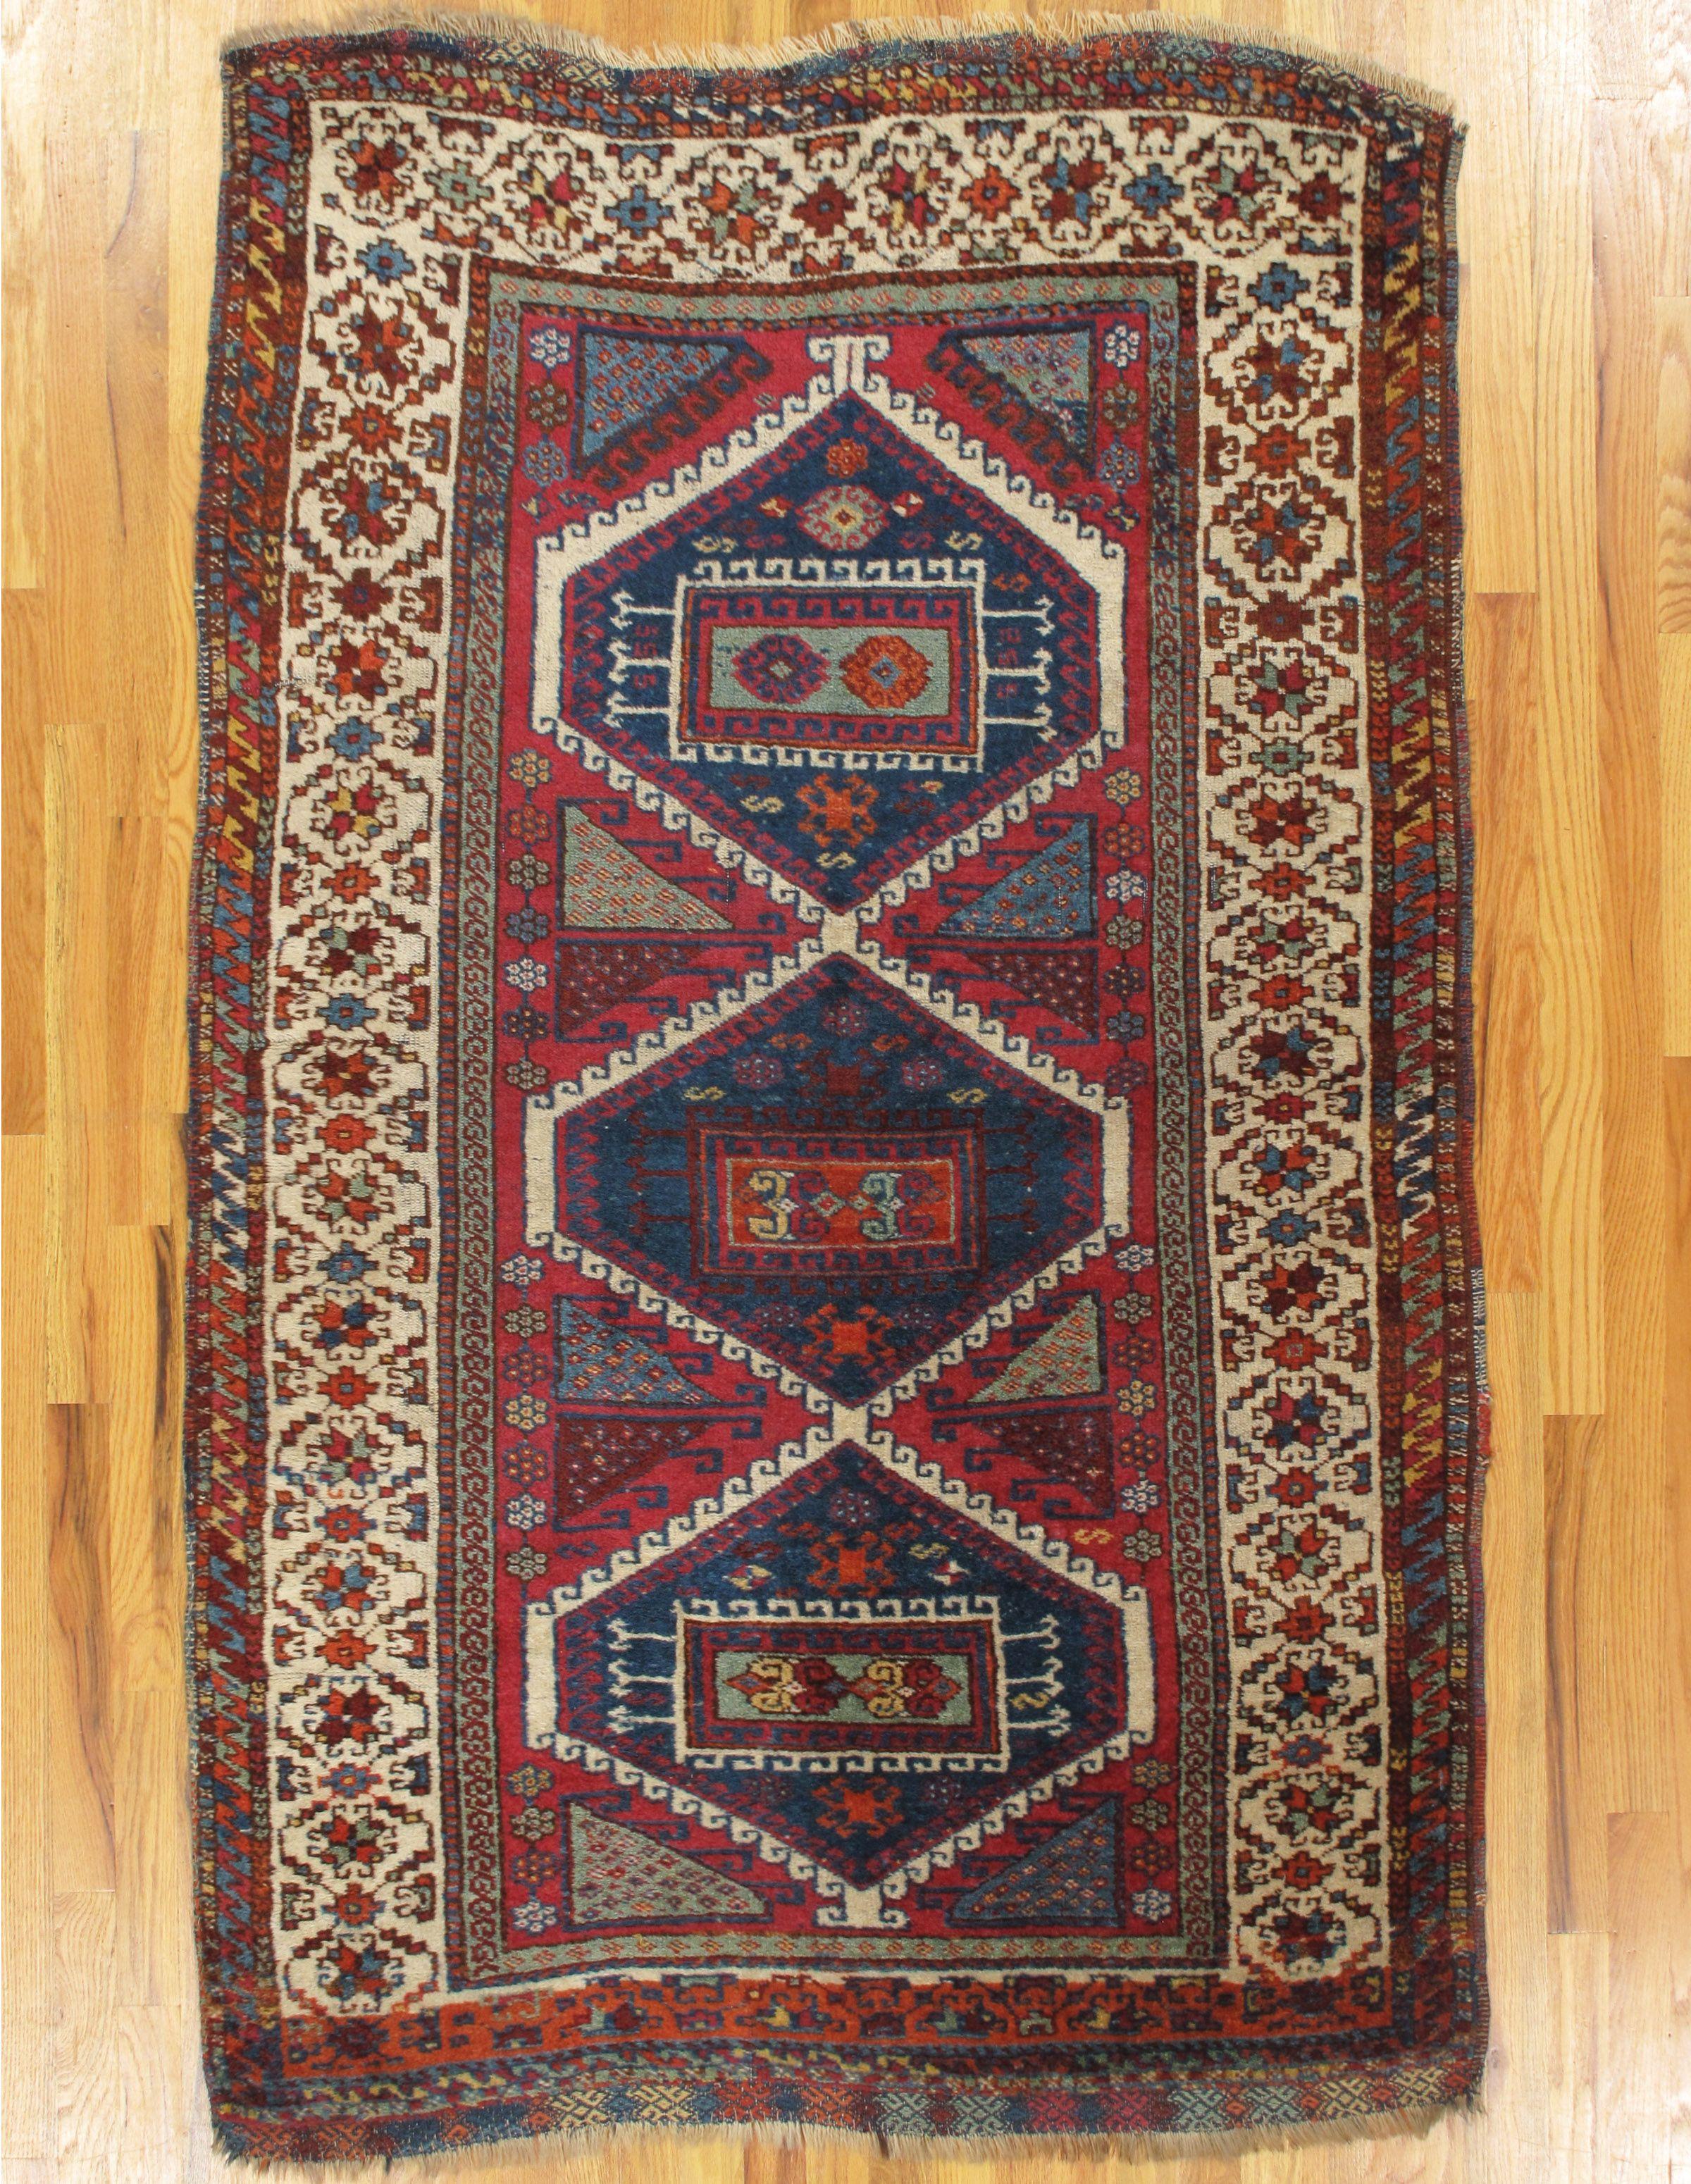 Yuruk Rug From Eastern Turkey Age Circa 1880 Size 6 4